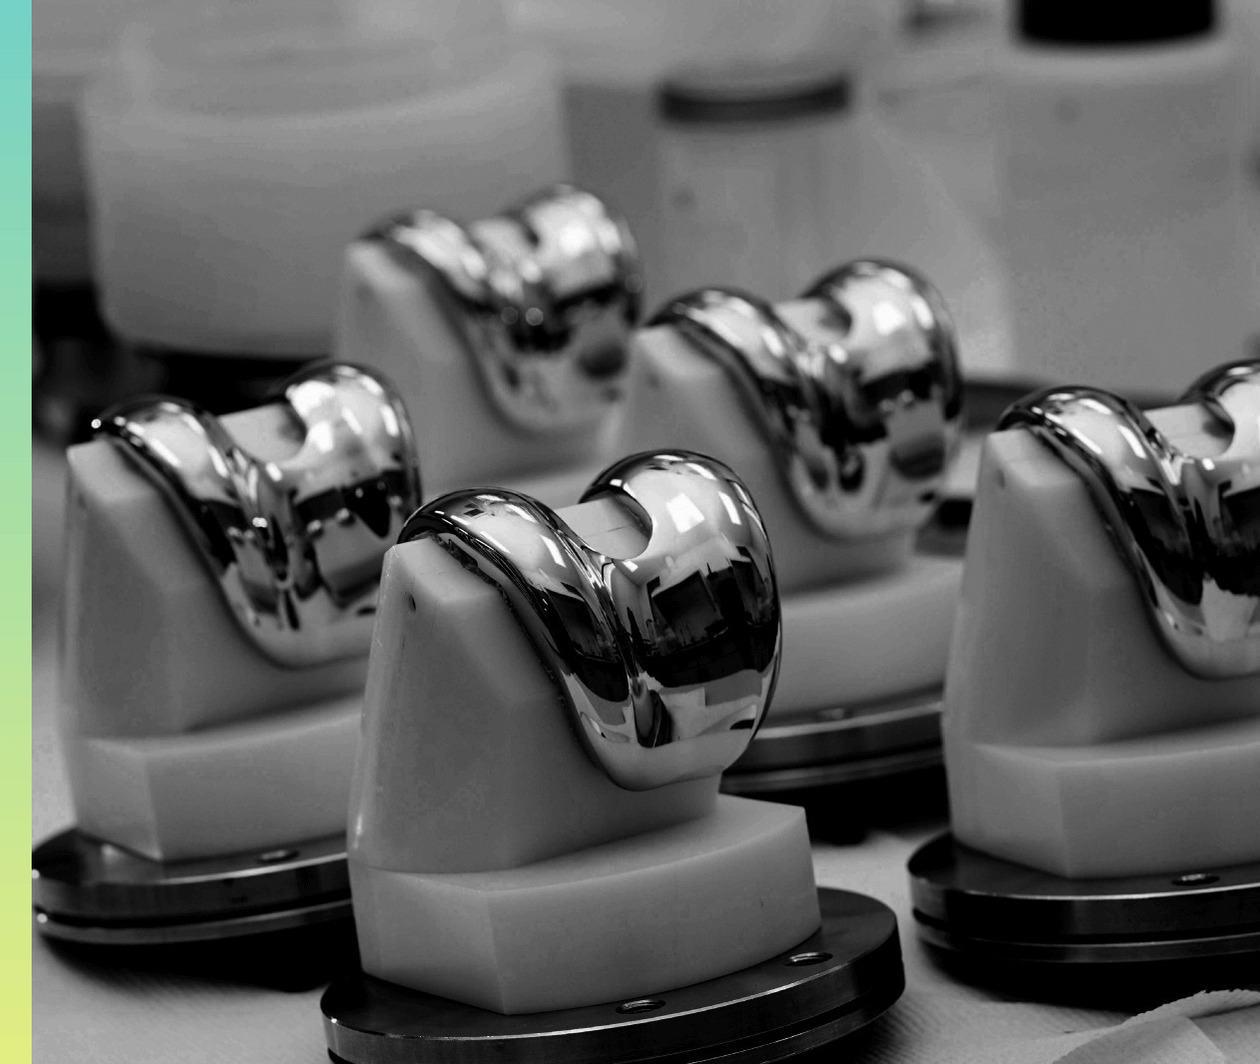 MedTech: Orthopaedic Implants and Regenerative Medicine